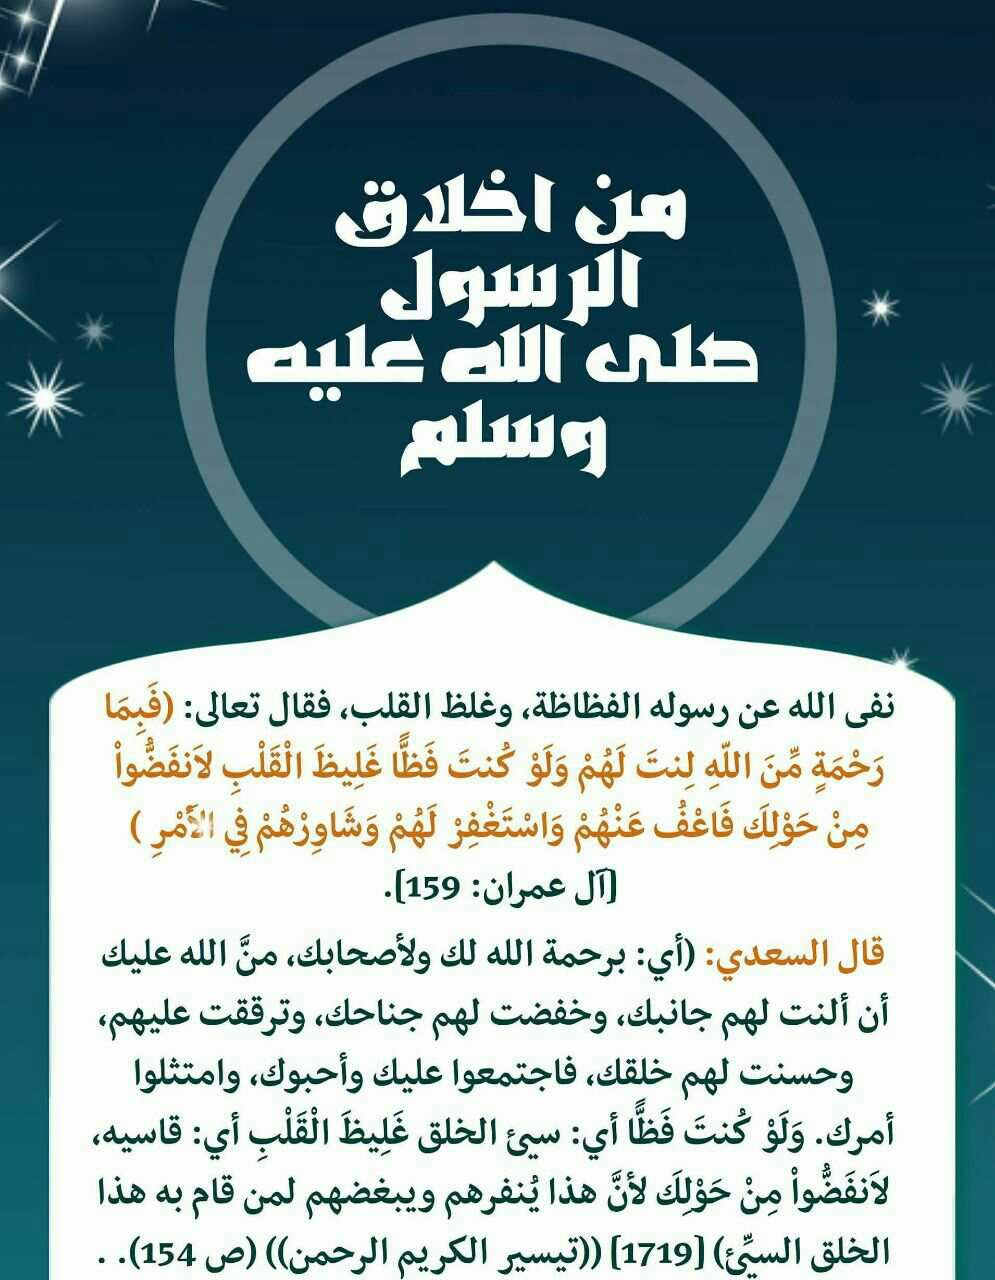 من اخلاق الرسول صلي الله عليه وسلم Islamic Phrases Peace Be Upon Him Peace